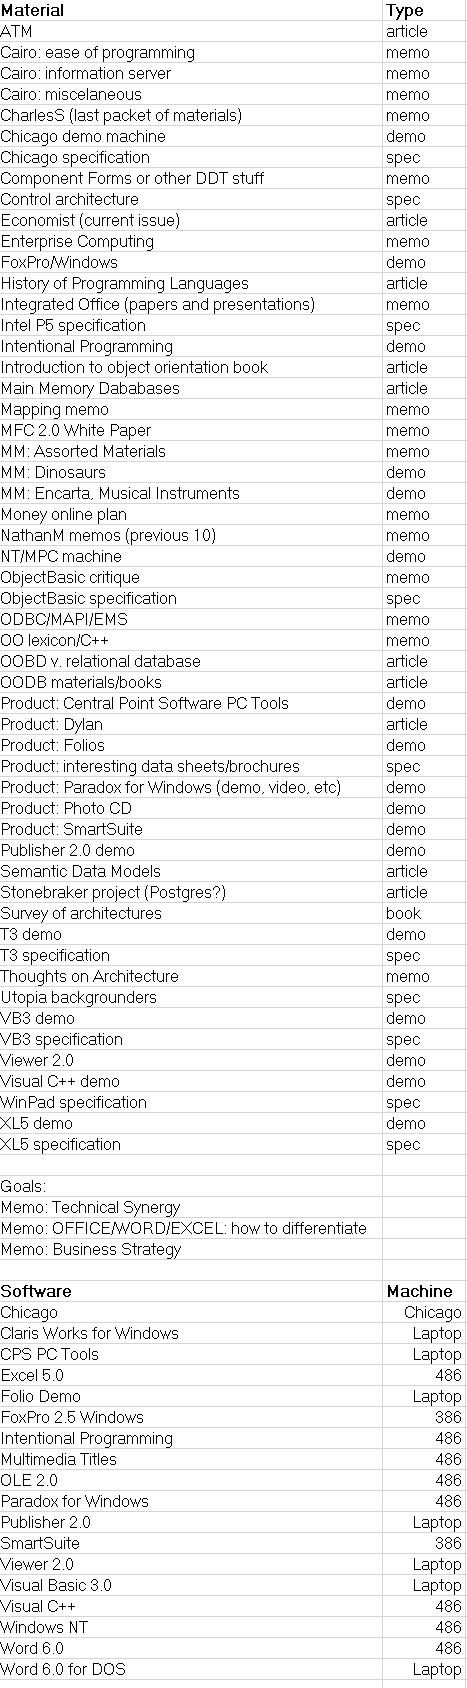 Spreadsheet of ThinkWeek materials.